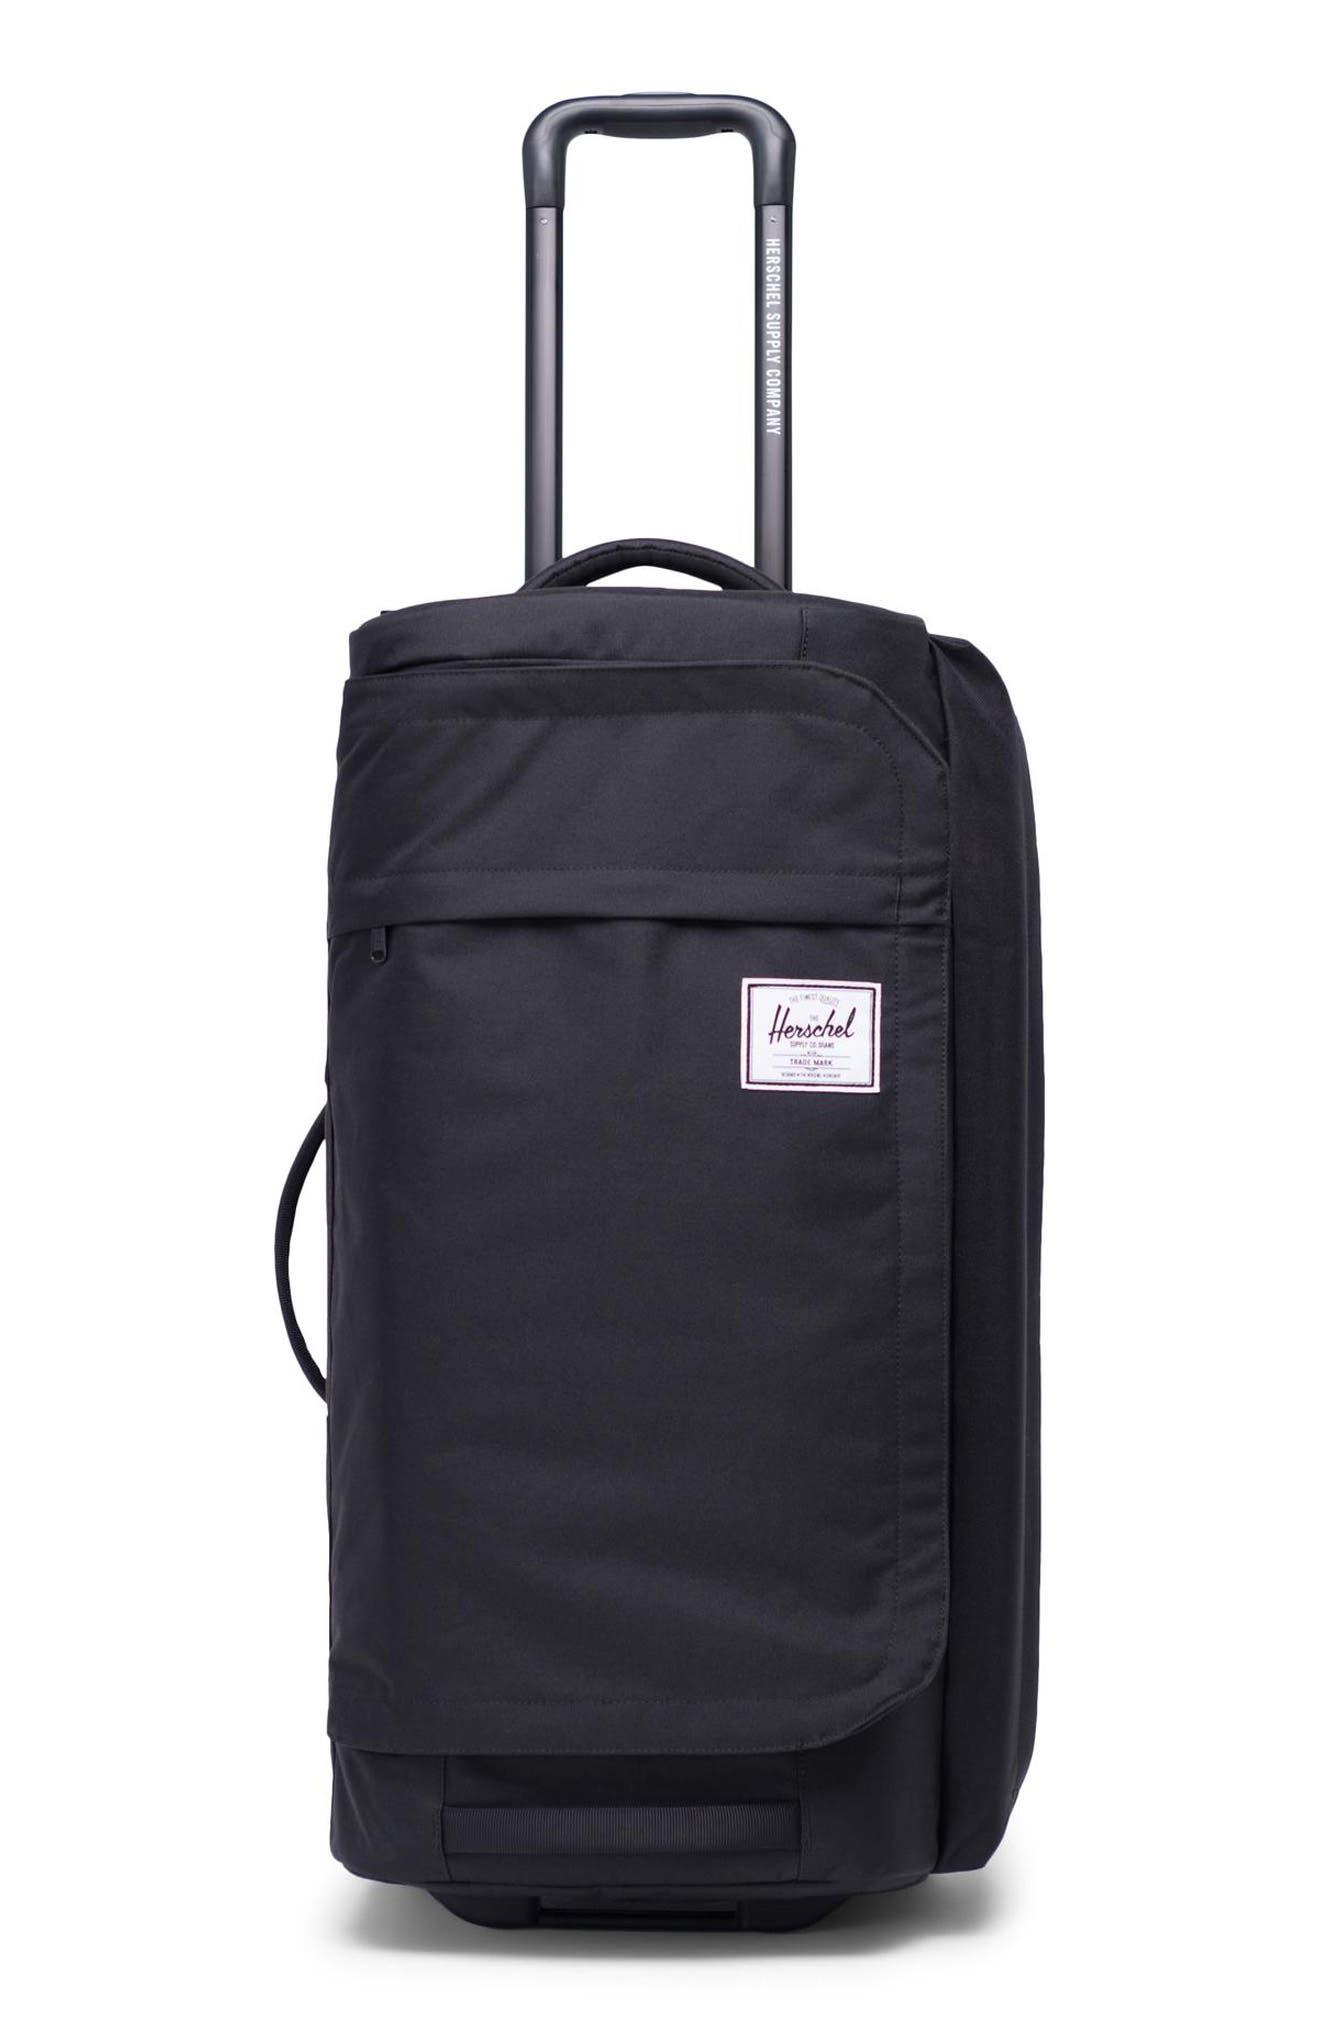 Wheelie Outfitter 24-Inch Duffel Bag,                             Main thumbnail 1, color,                             BLACK